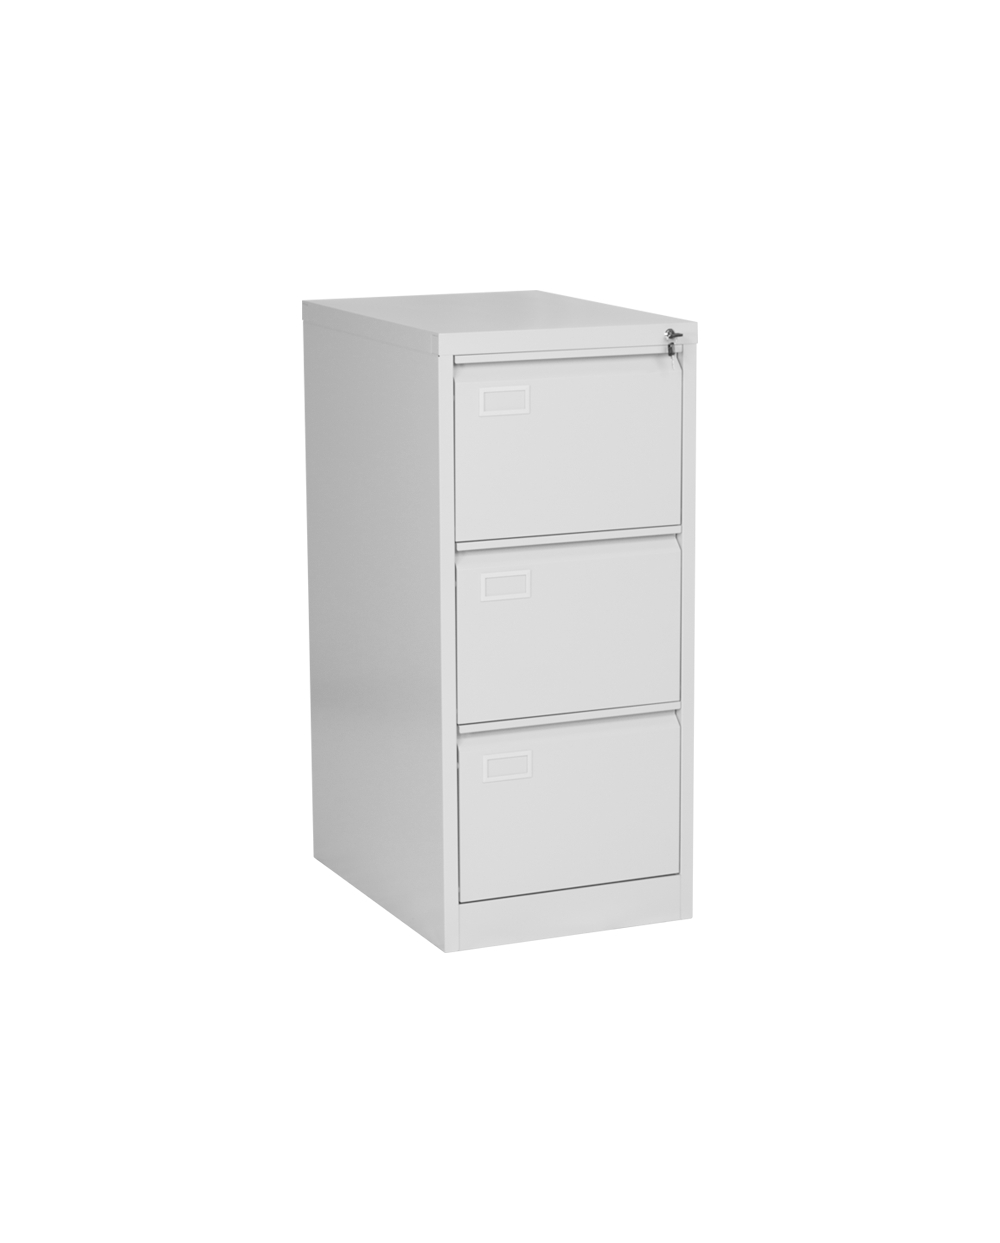 Метален офис контейнер Carmen CR-1231 J